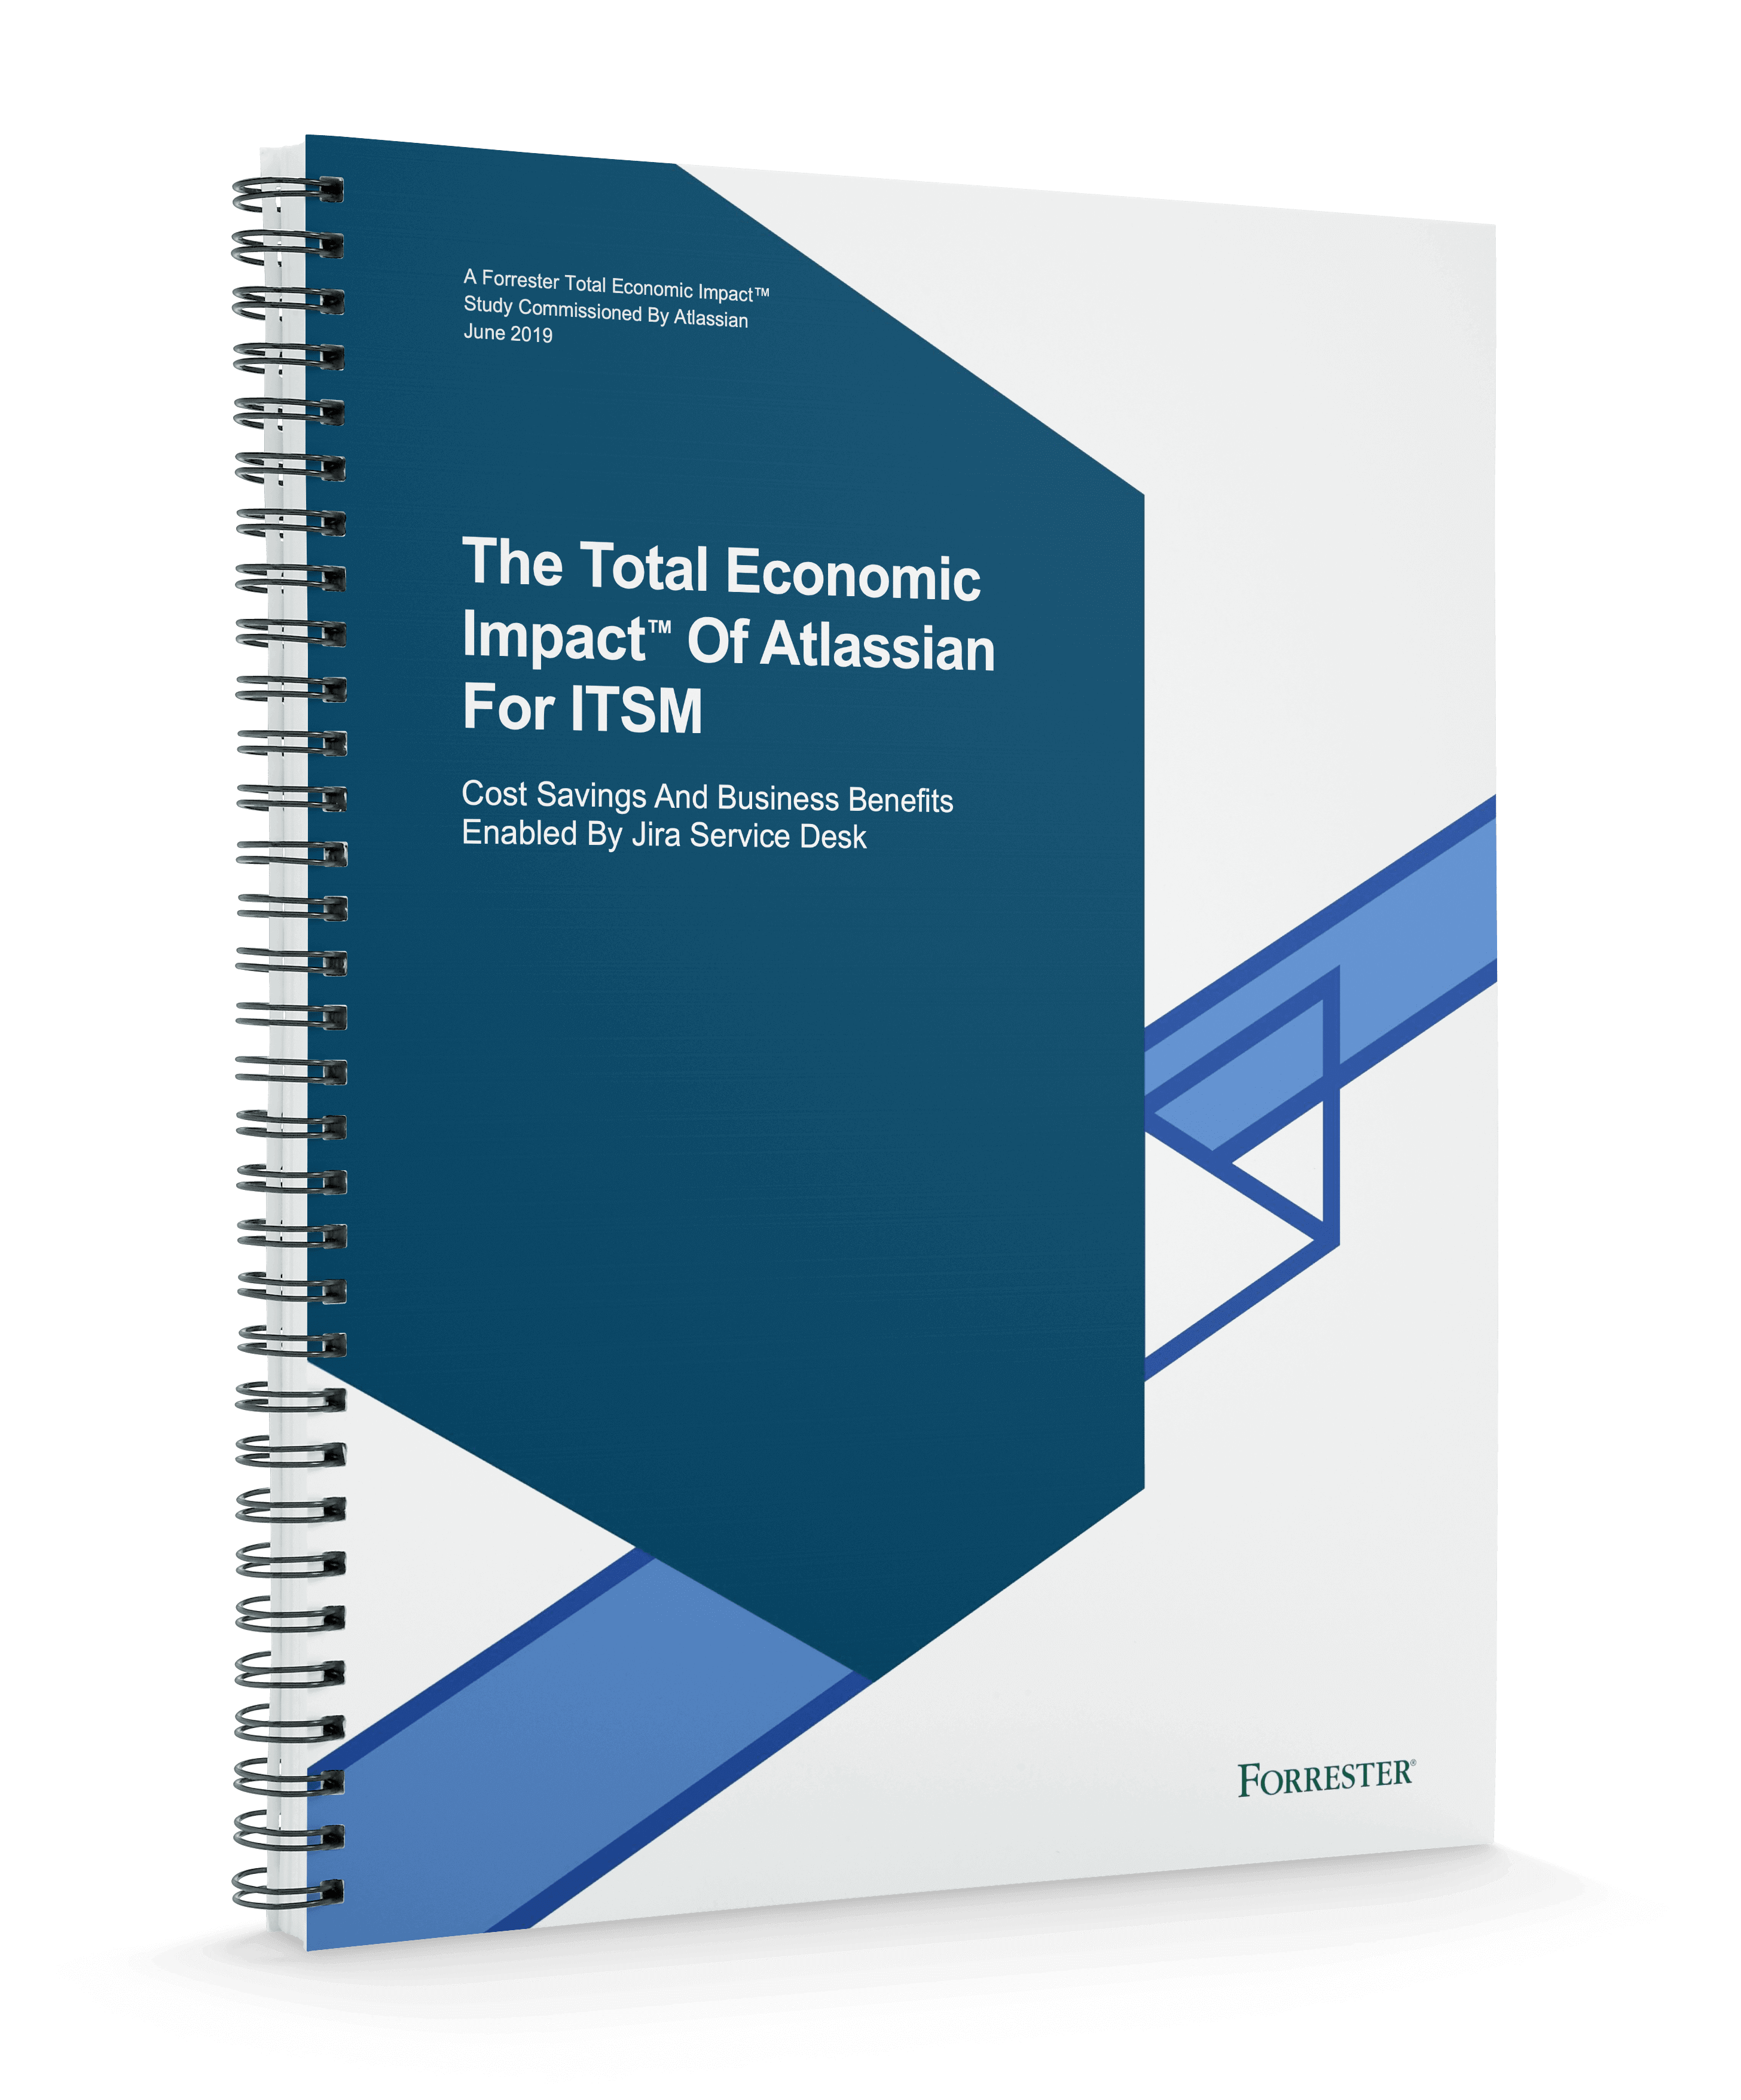 Forrester Total Economic Impact™ de Atlassian para ITSM